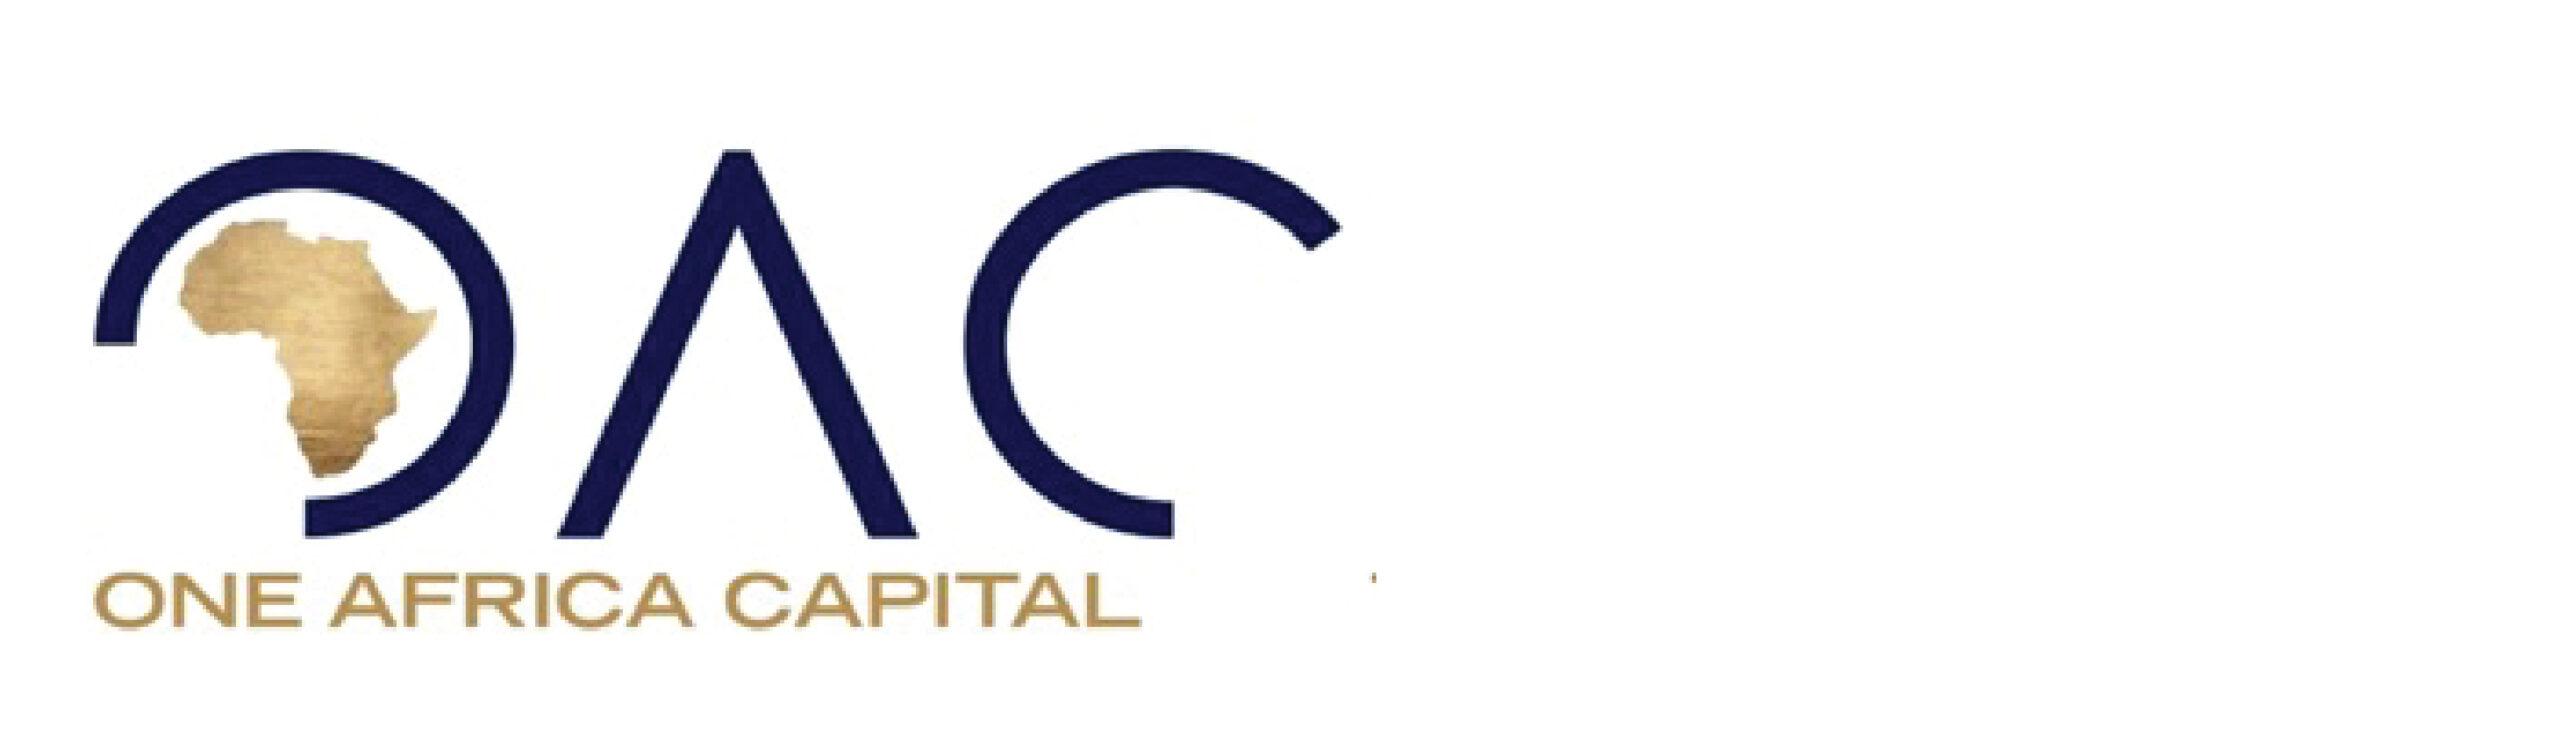 One Africa Capital